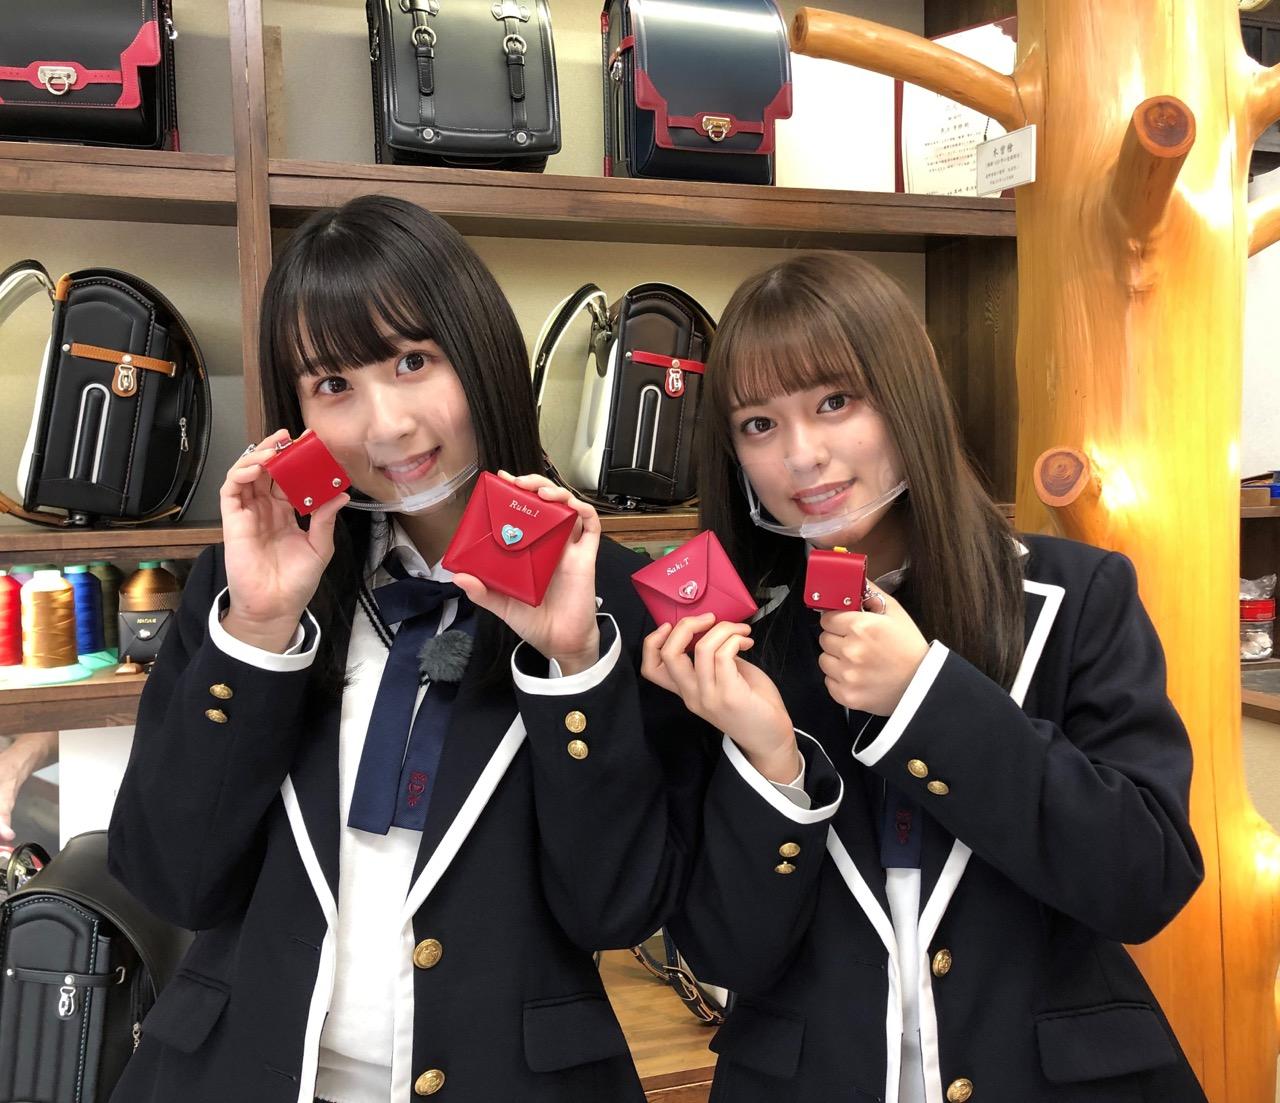 「SKE48は君と歌いたい」井上瑠夏&竹内彩姫が名古屋市北区のランドセル工房を訪れる②【東海テレビ】